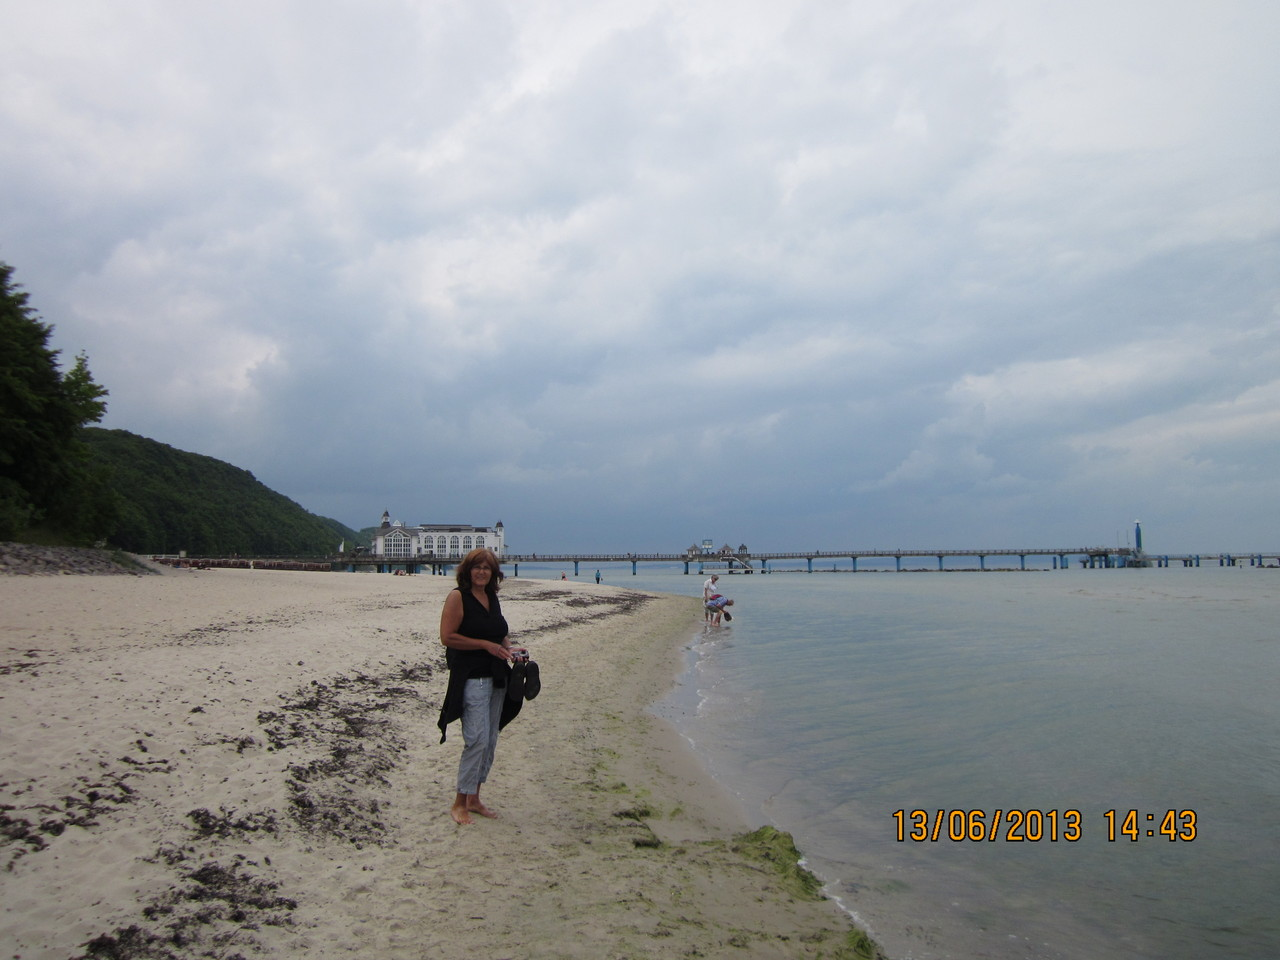 Am Strand entlang zur Seebrücke